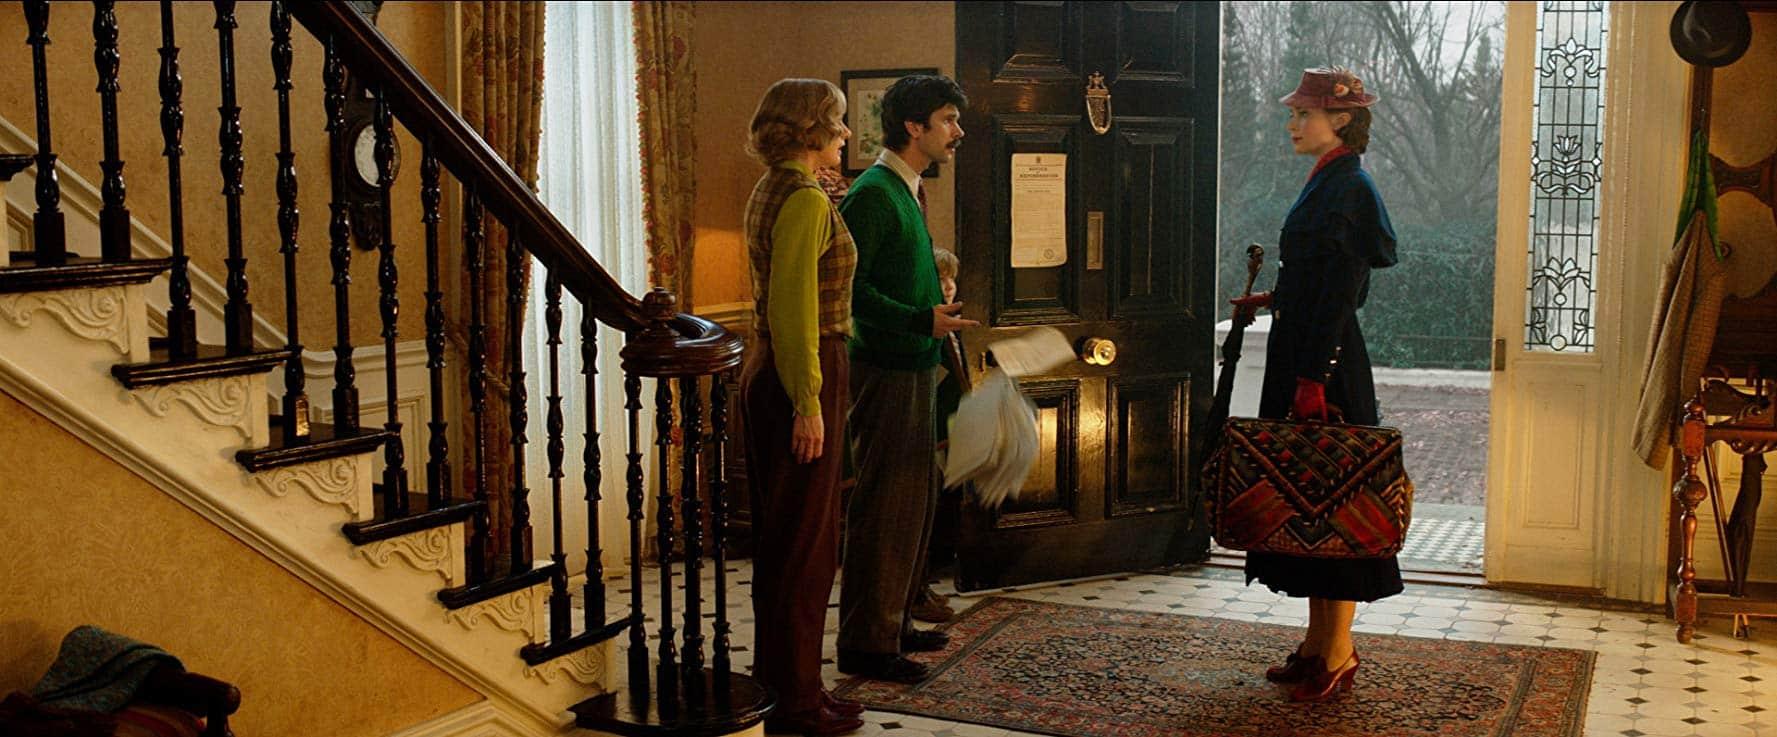 Mary Poppins Returns libera primer tráiler y no puedes perdértelo acá